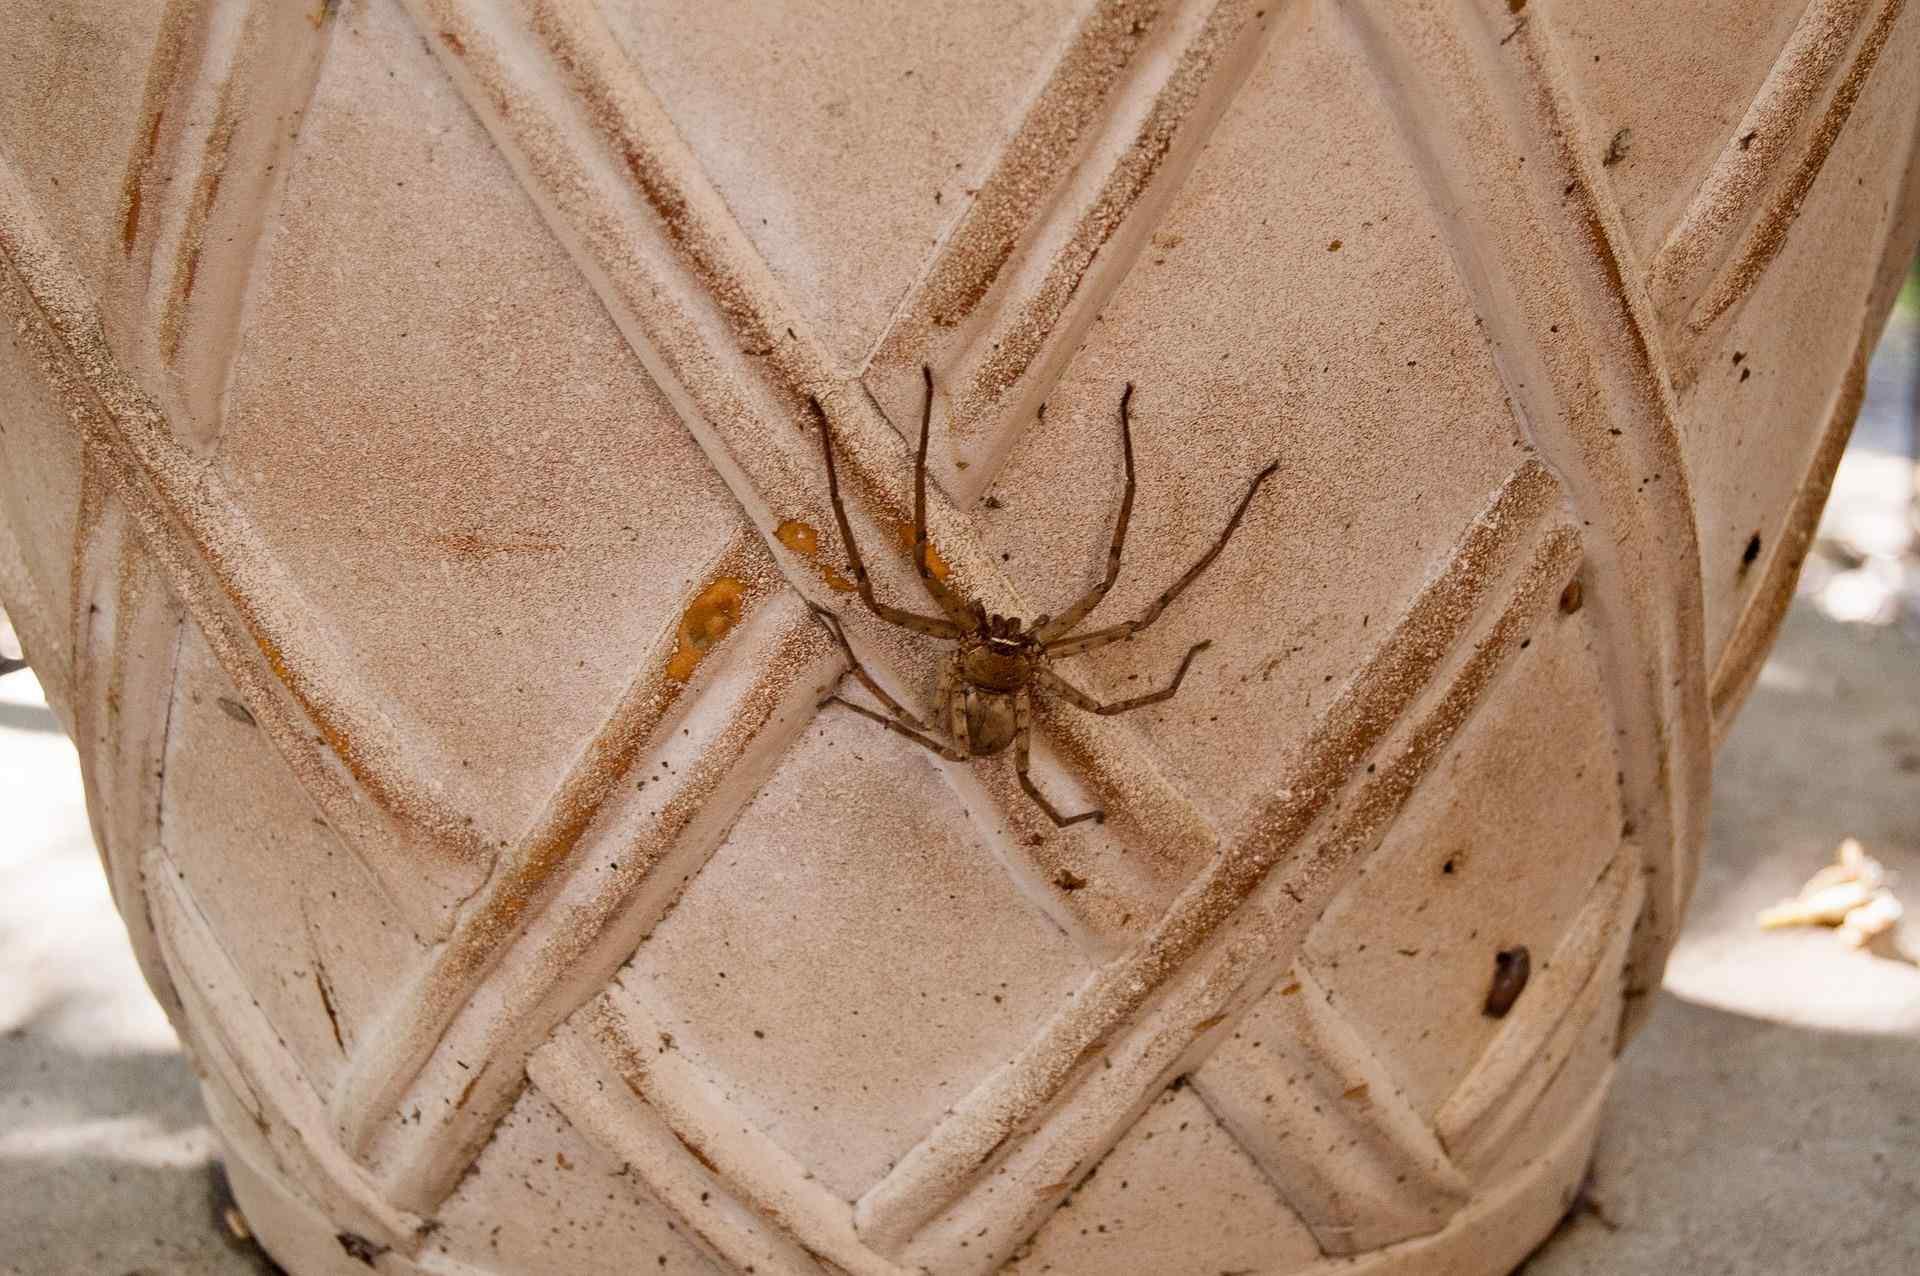 THE HUNTSMAN SPIDER